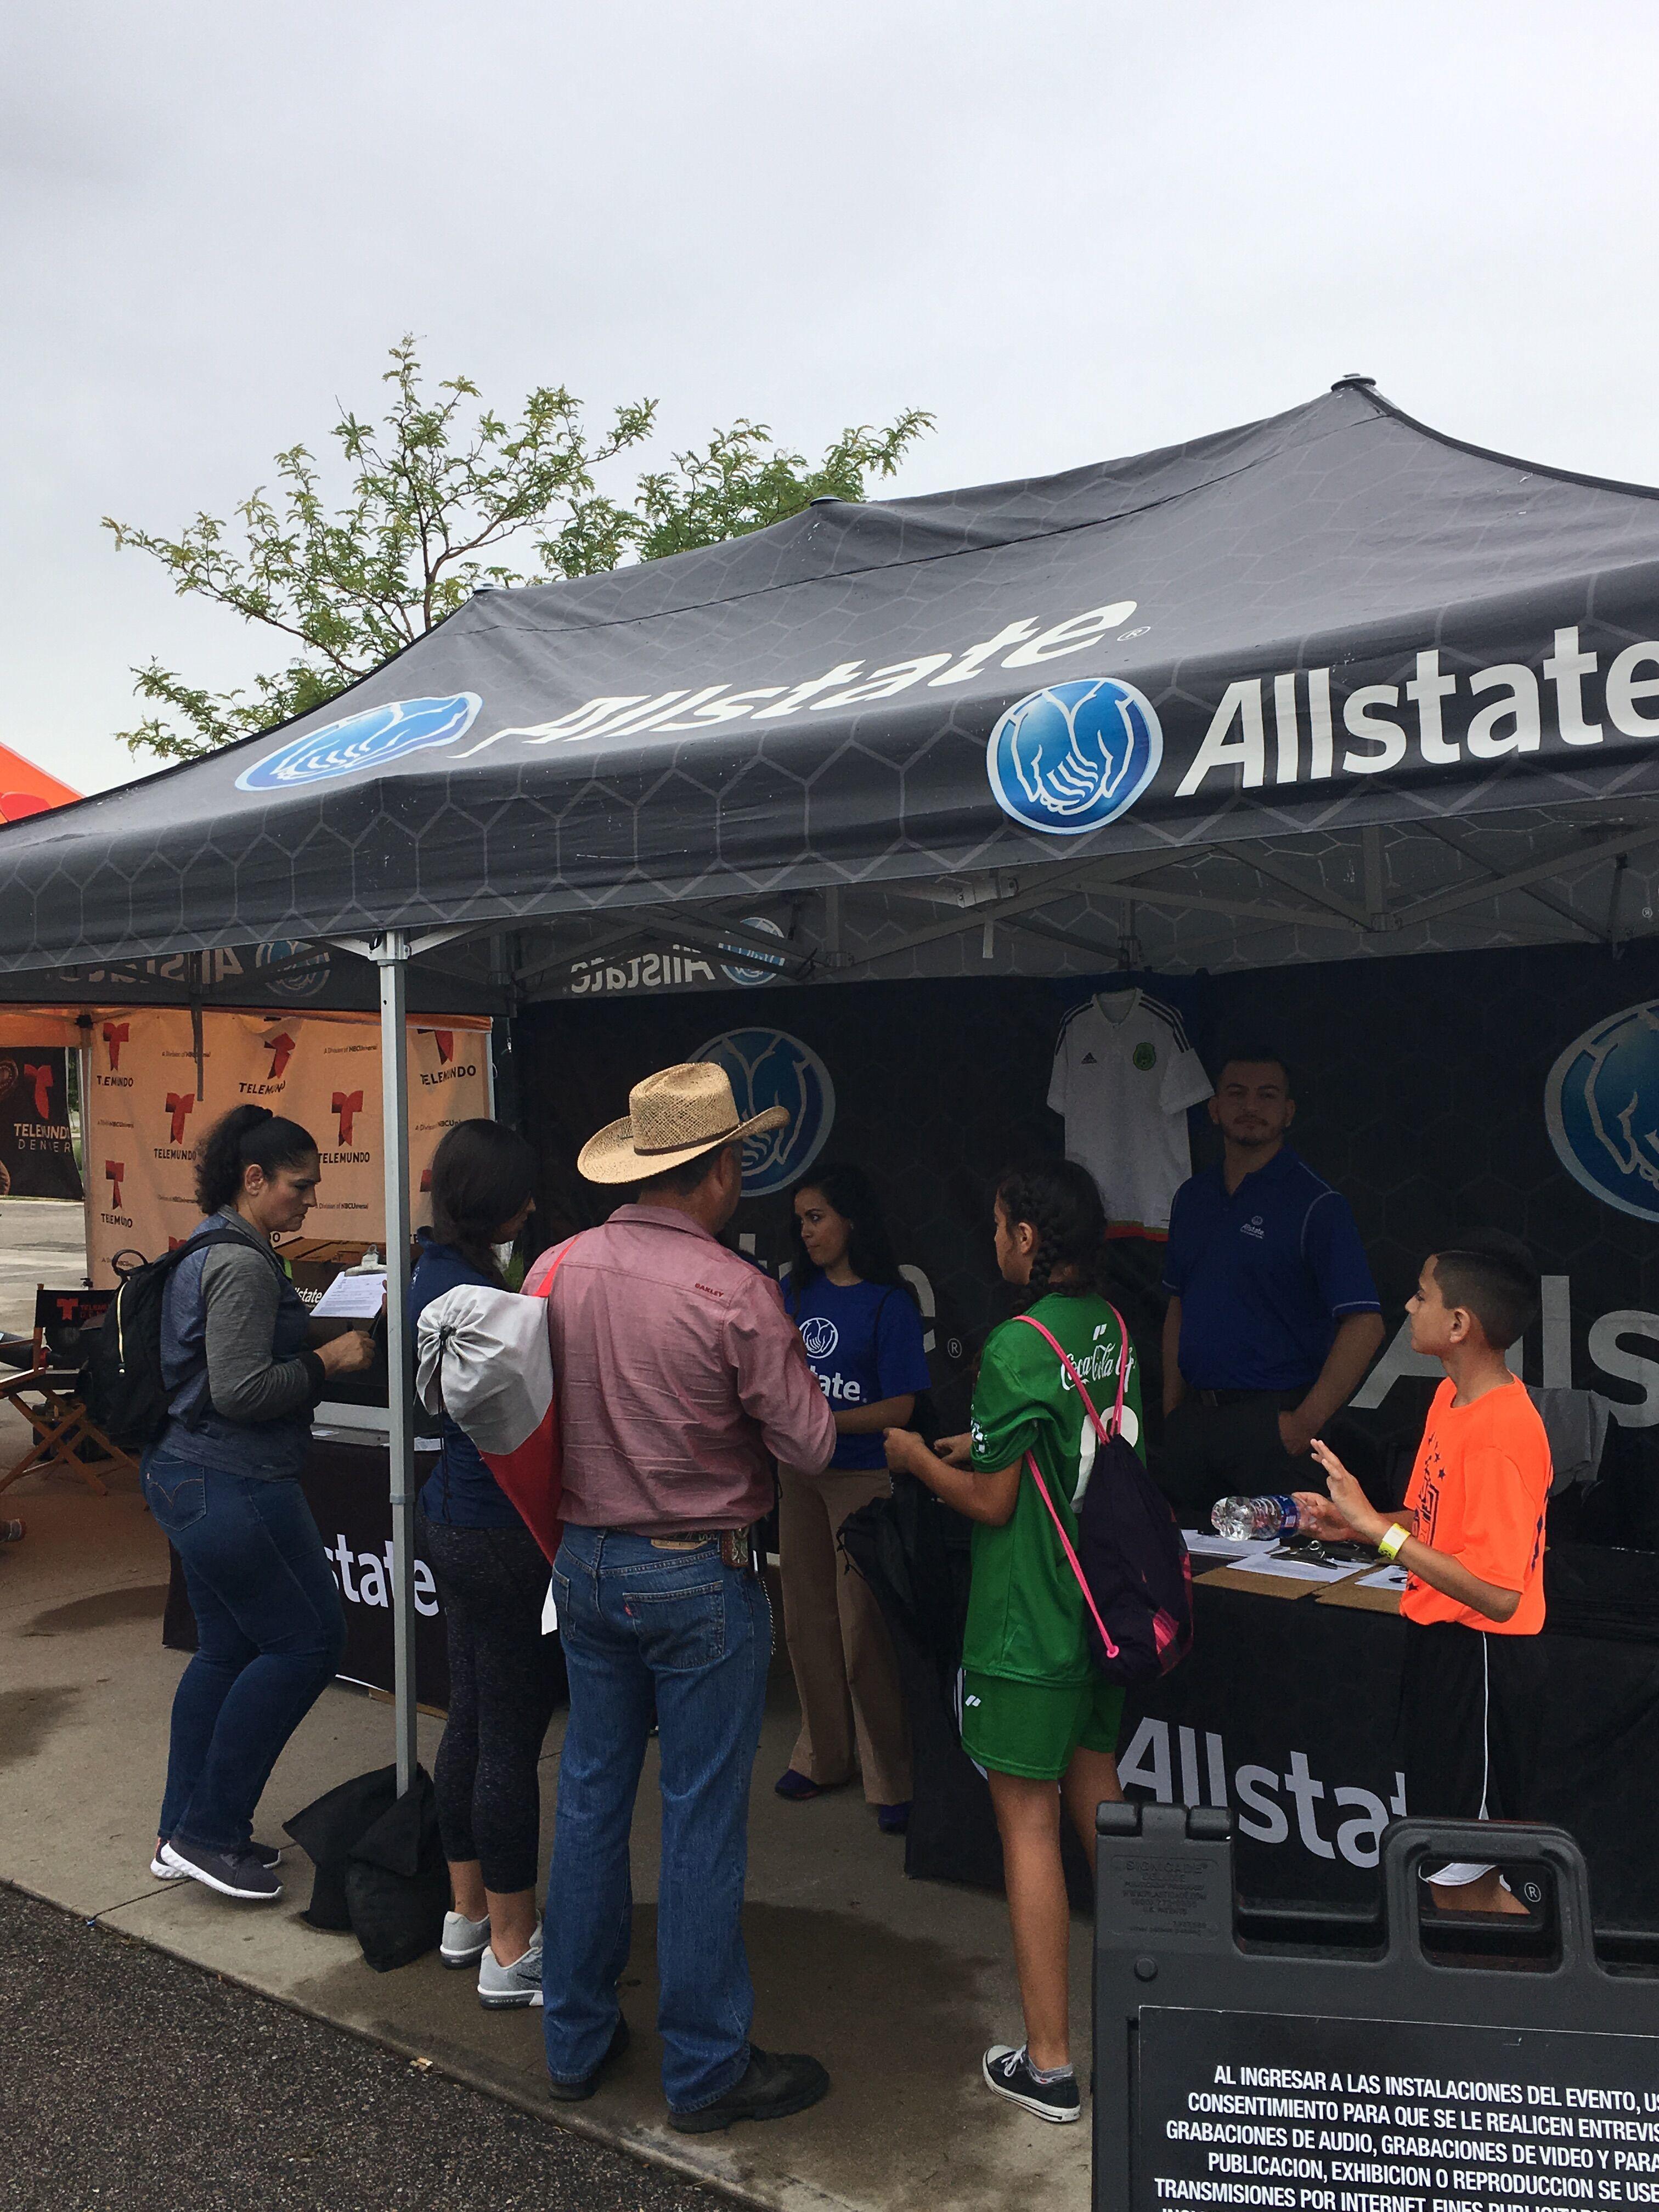 Juanita K. Martin: Allstate Insurance image 28